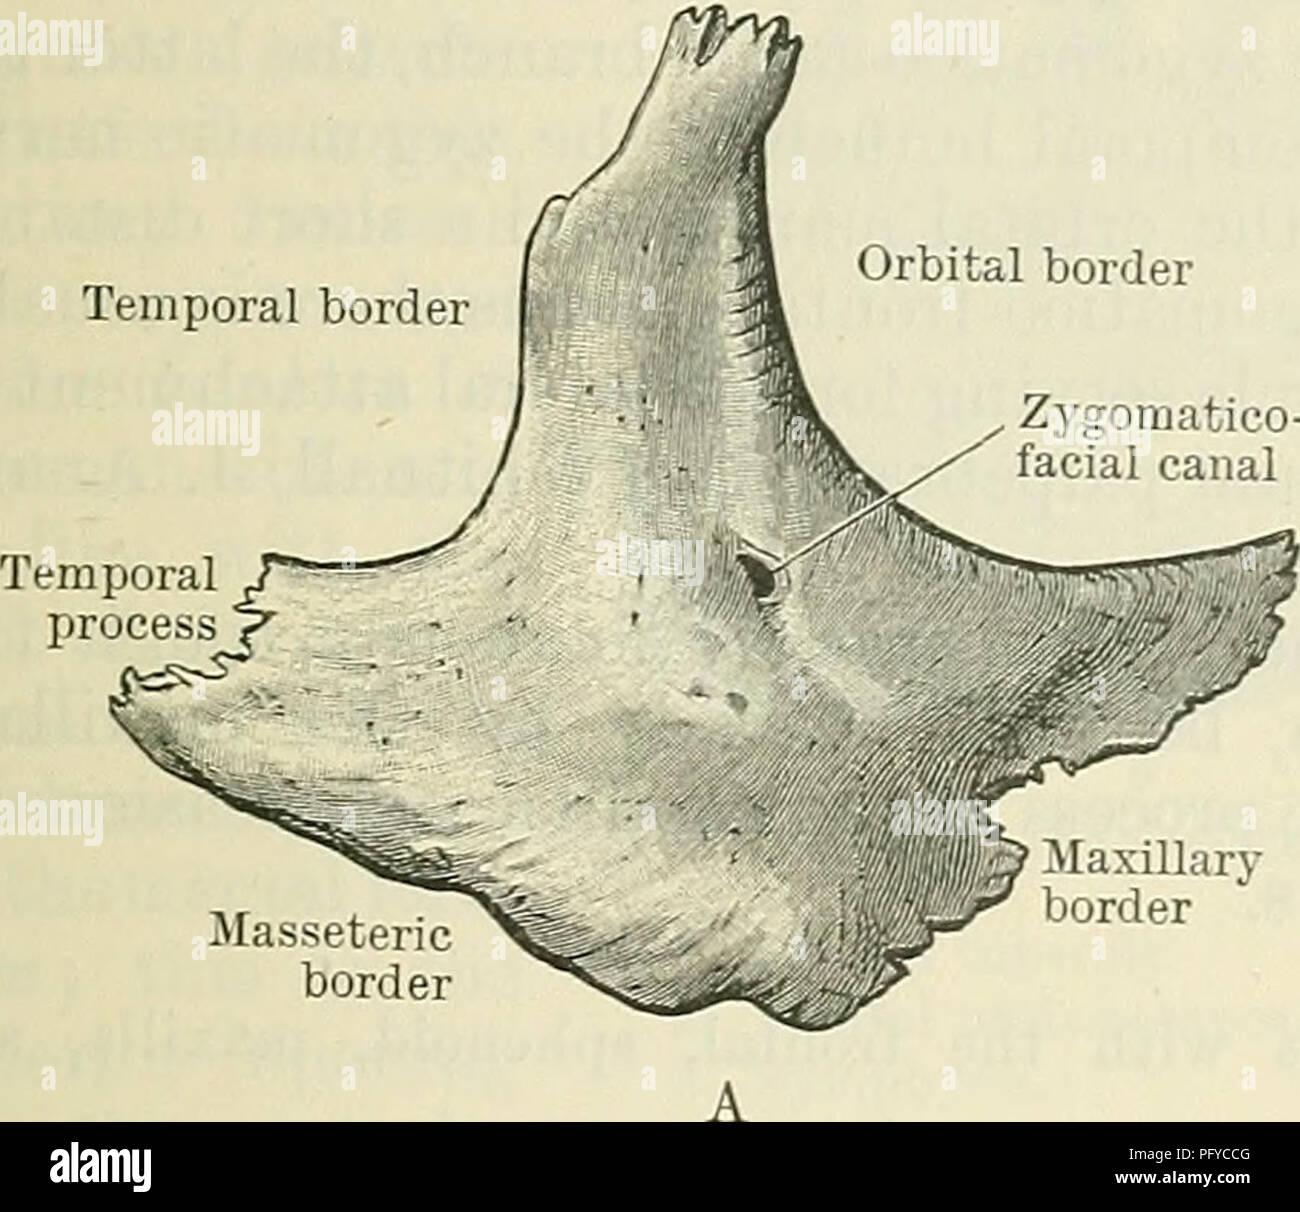 Orbital Bone Imágenes De Stock & Orbital Bone Fotos De Stock - Alamy